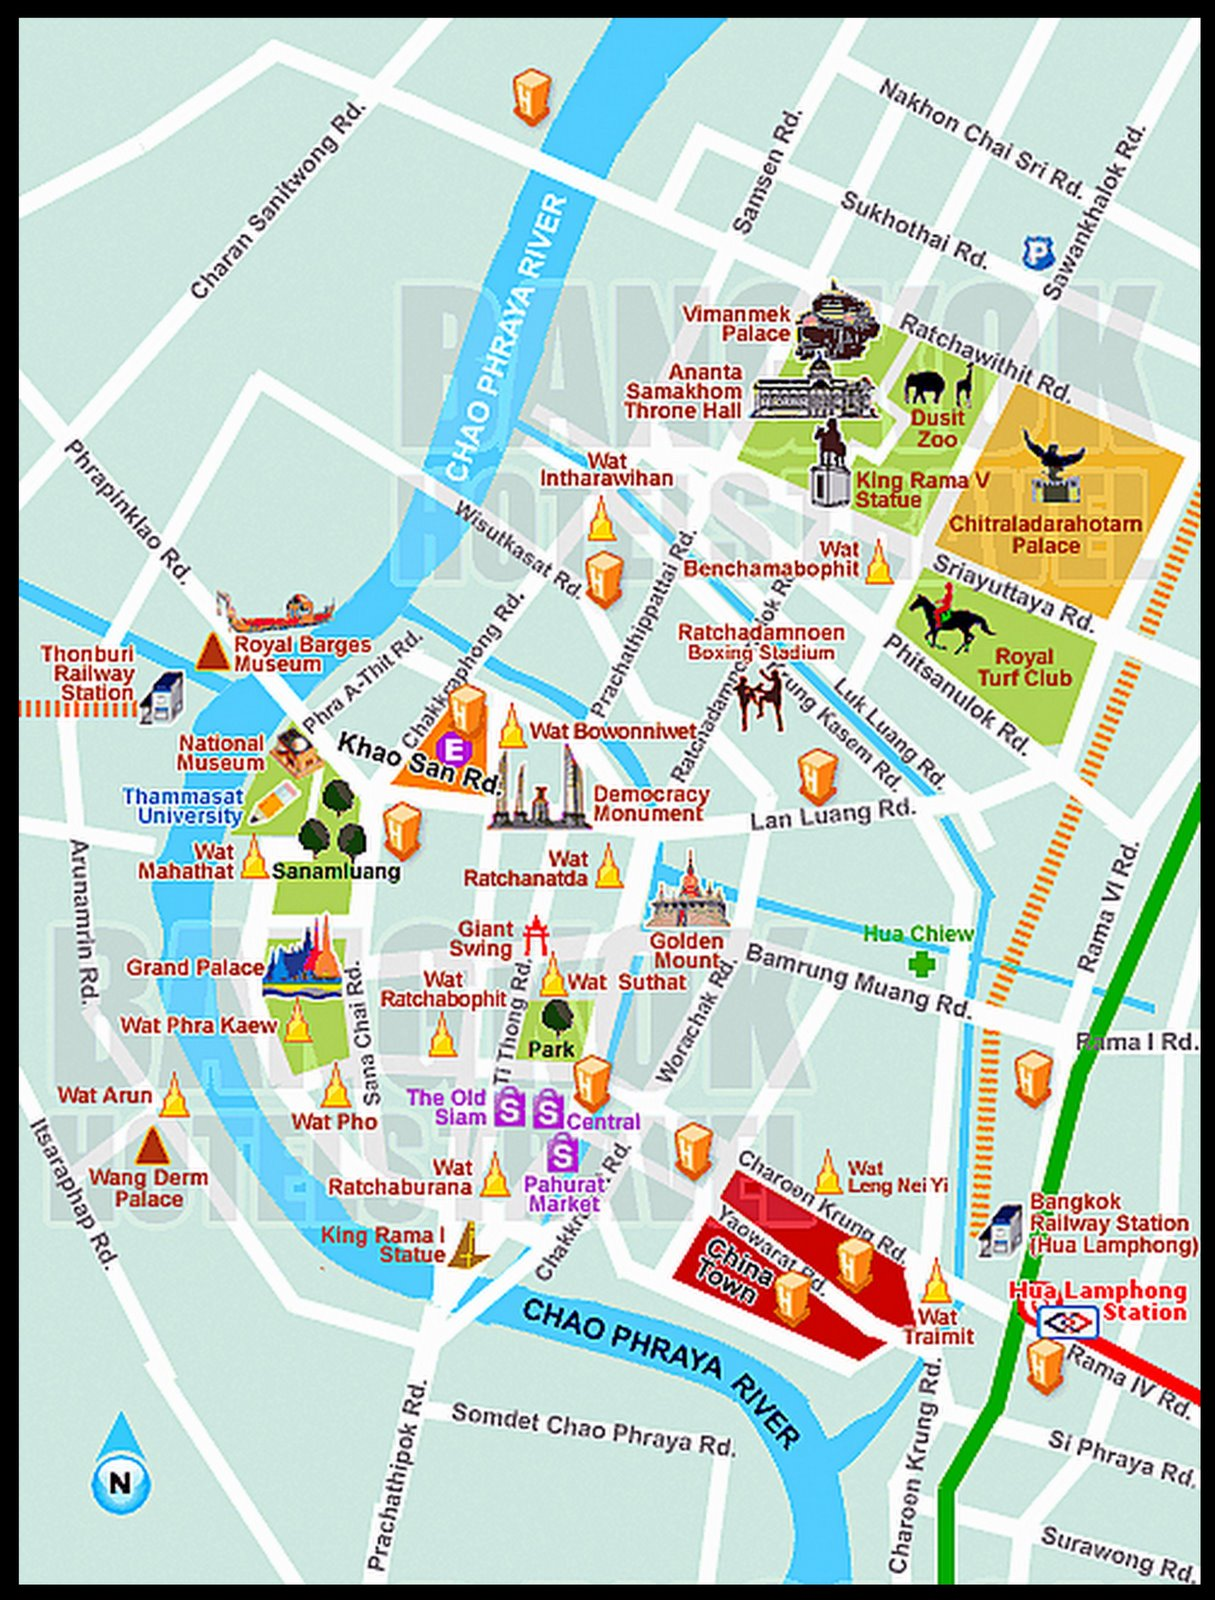 Osaka Kobe Kyoto Map Tourist Attractions - HolidayMapQ.com